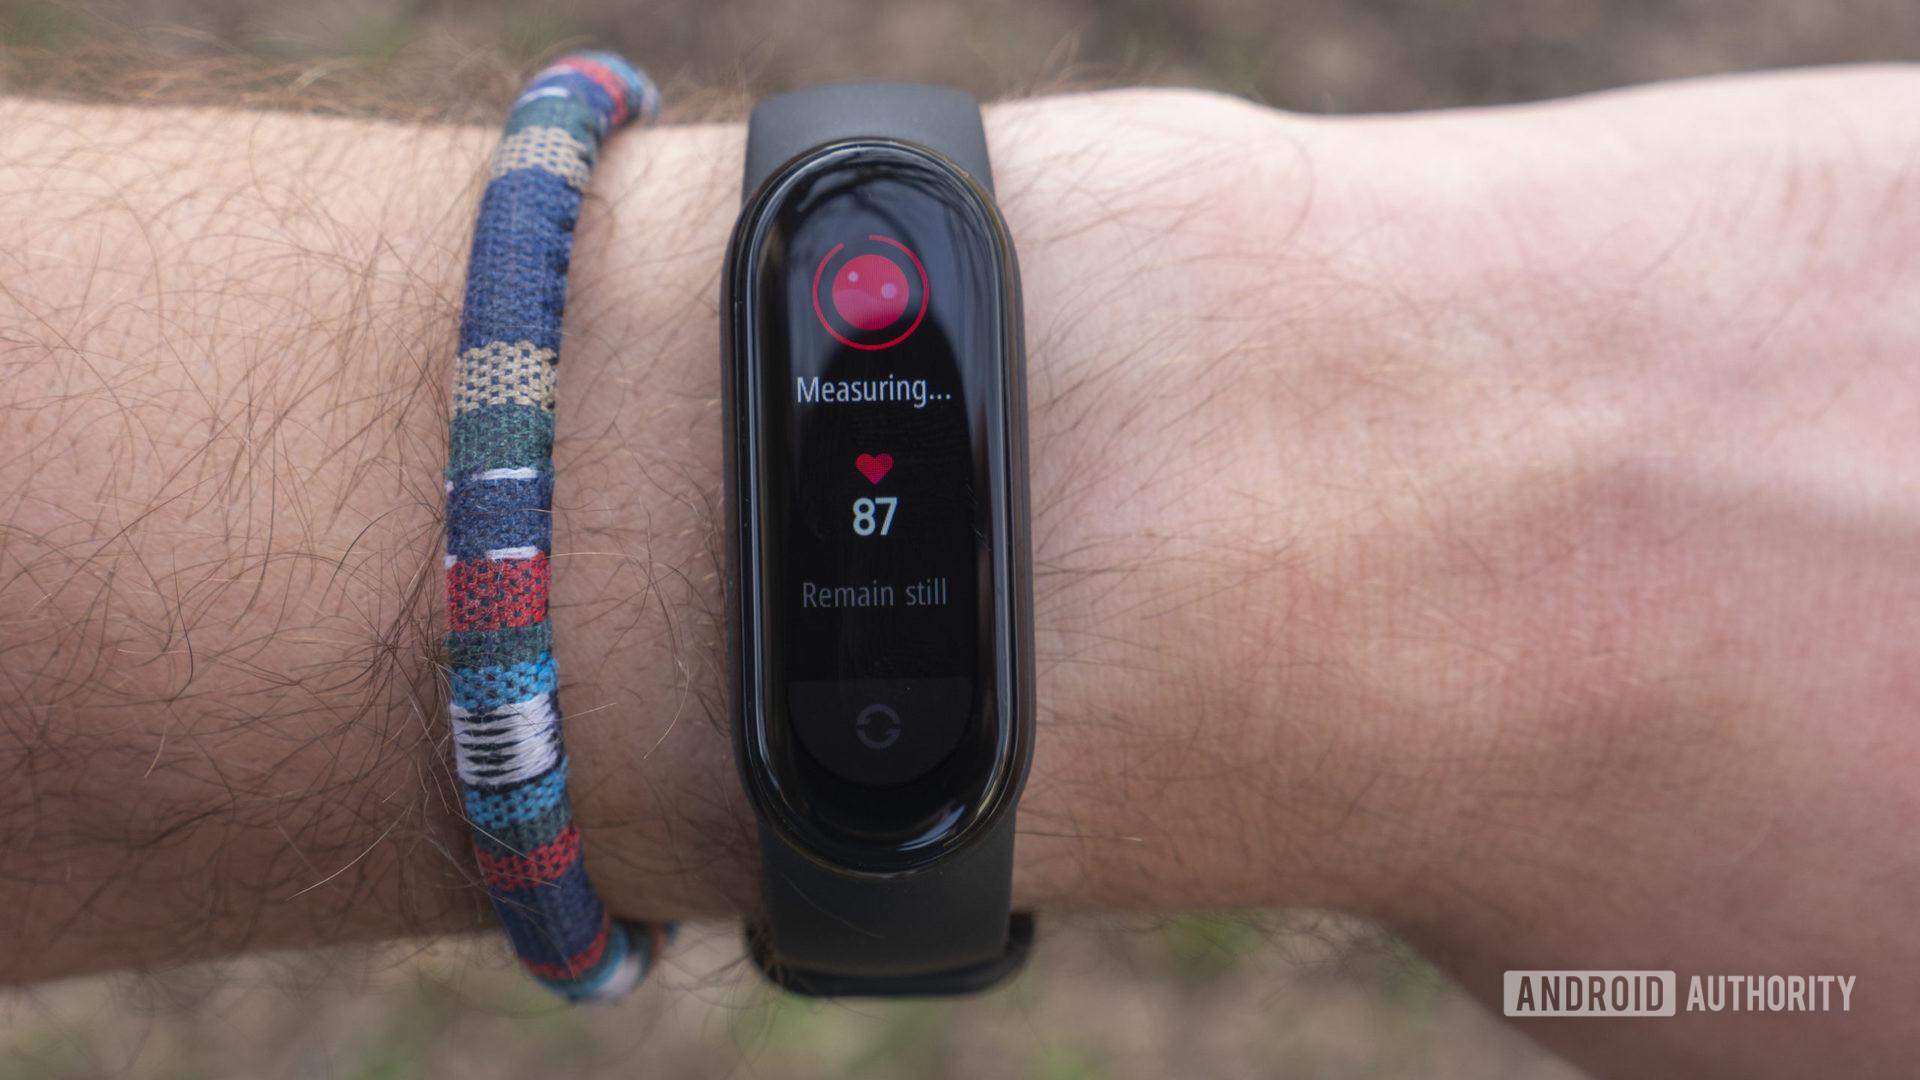 xiaomi mi band 6 review spo2 blood oxygen tracking pulse oximeter